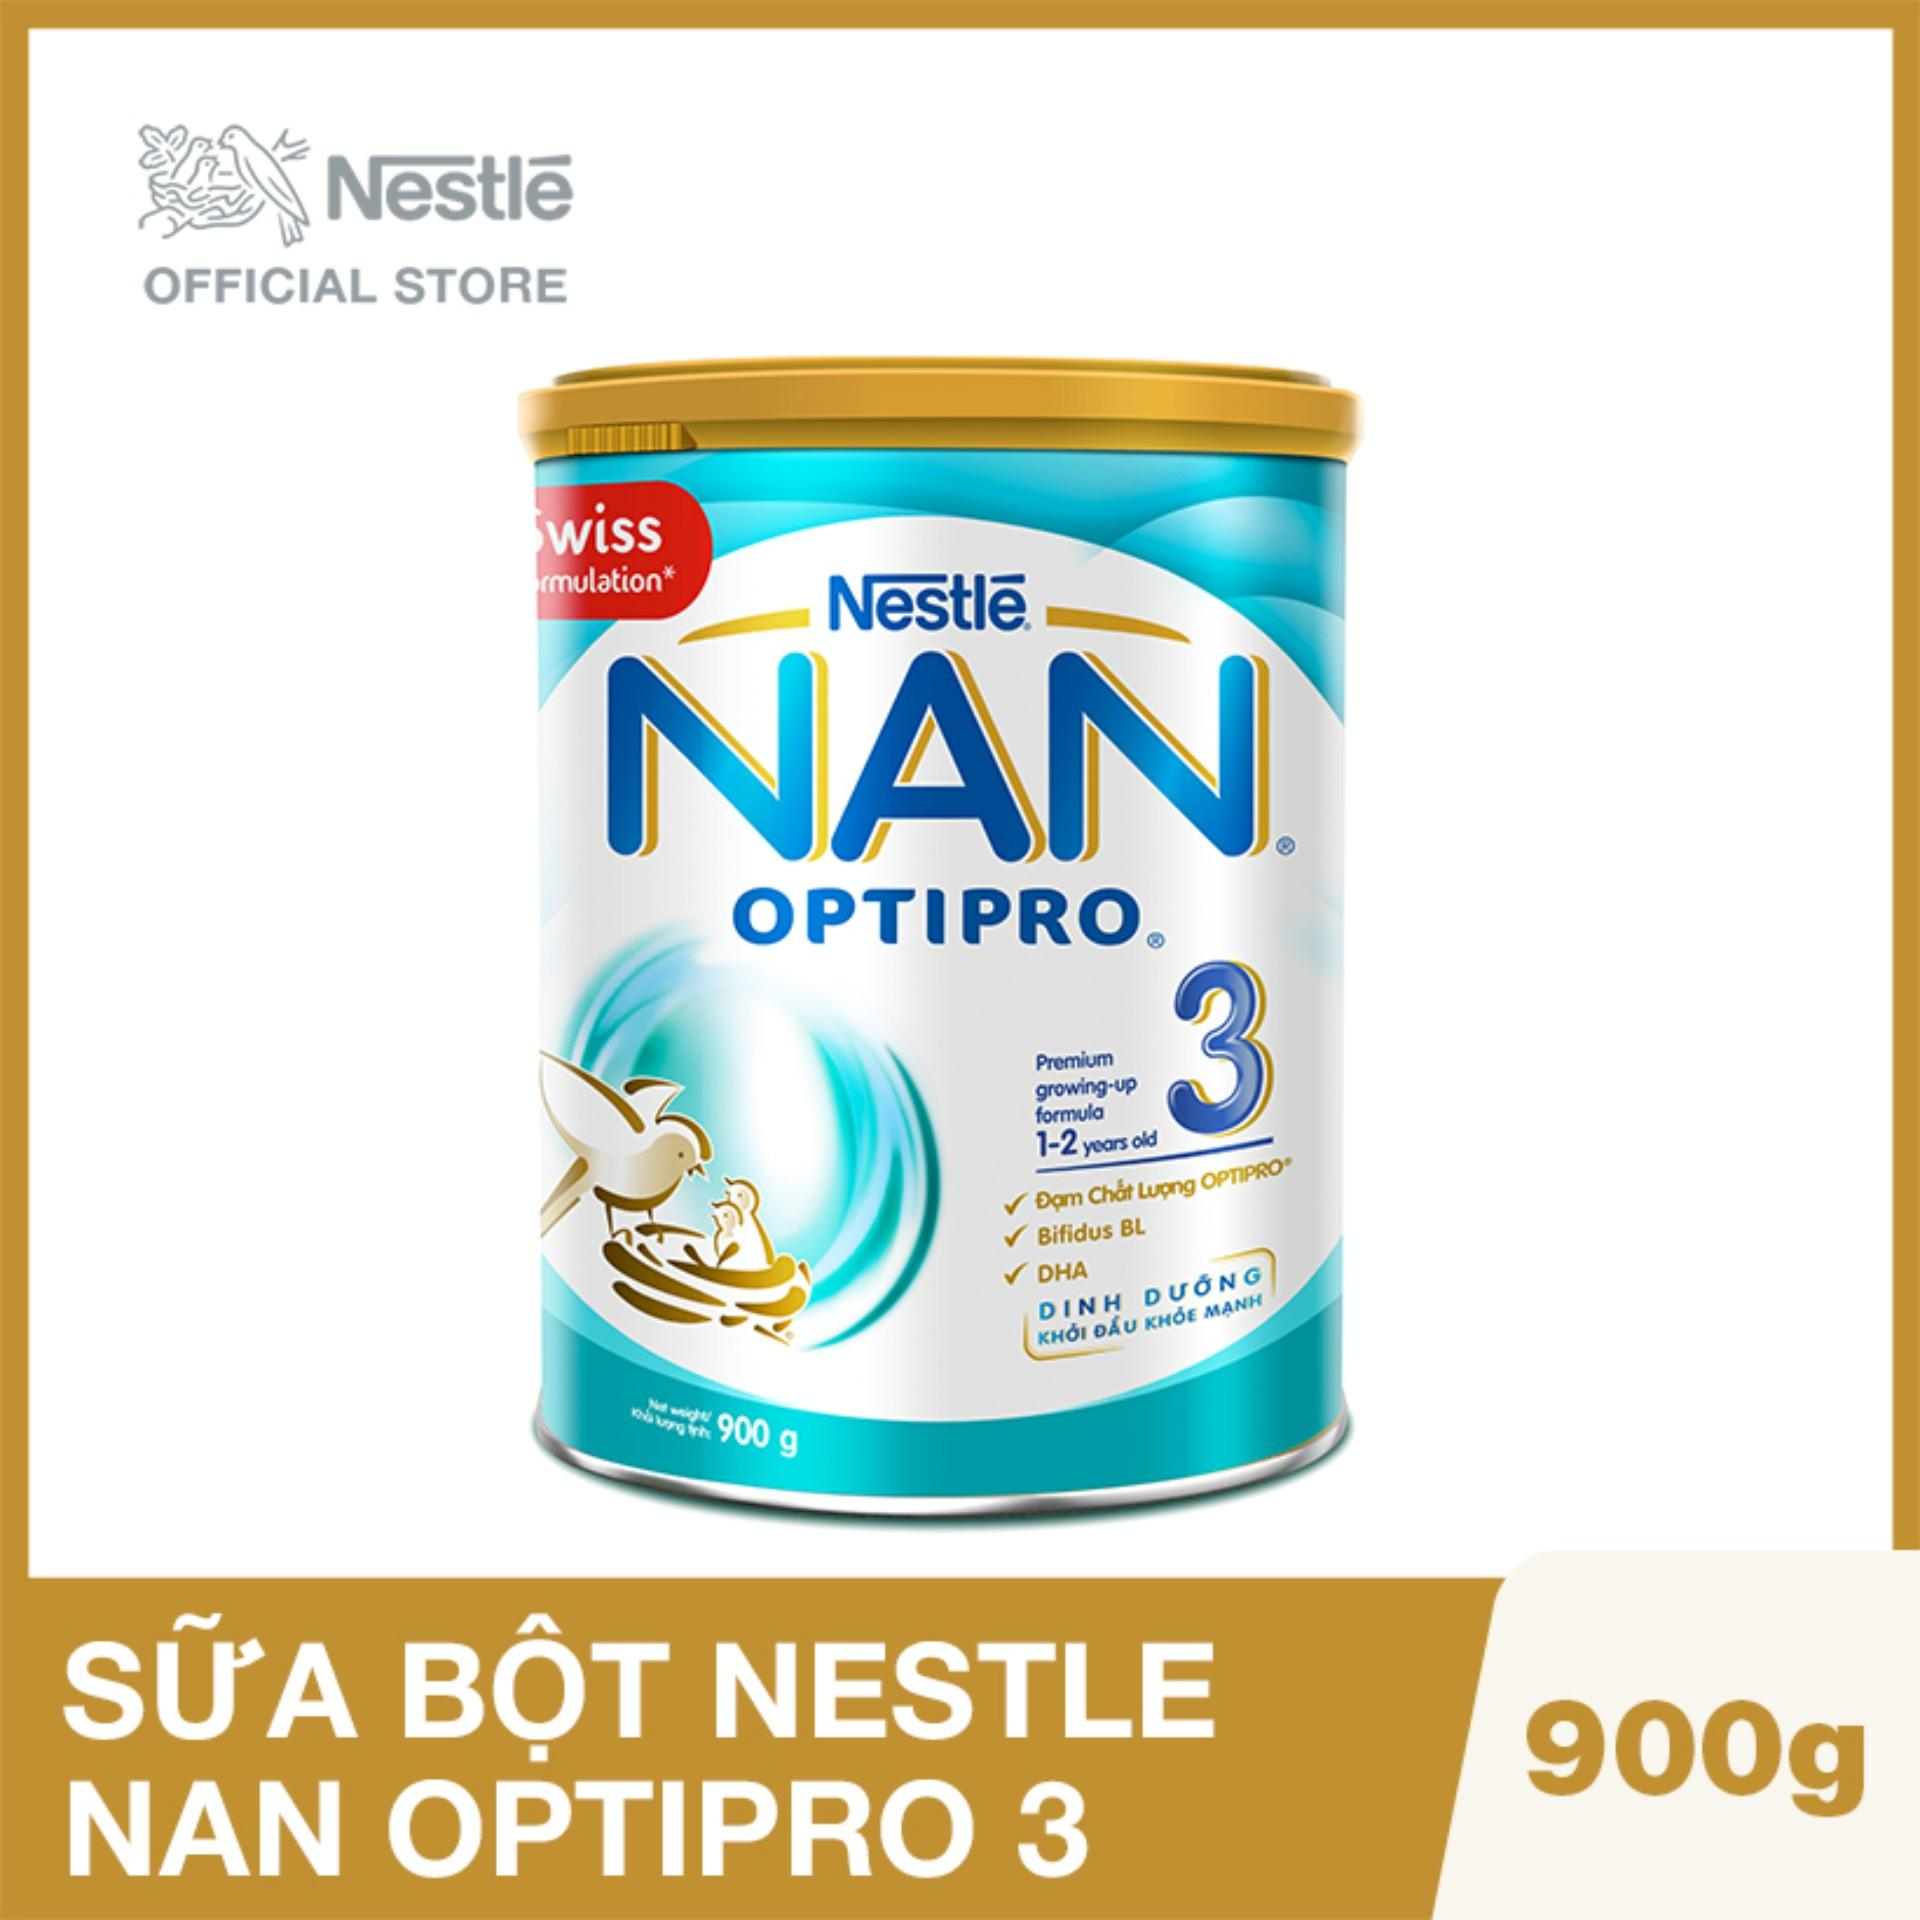 Sữa bột Nestle NAN OPTIPRO 3 (900g)